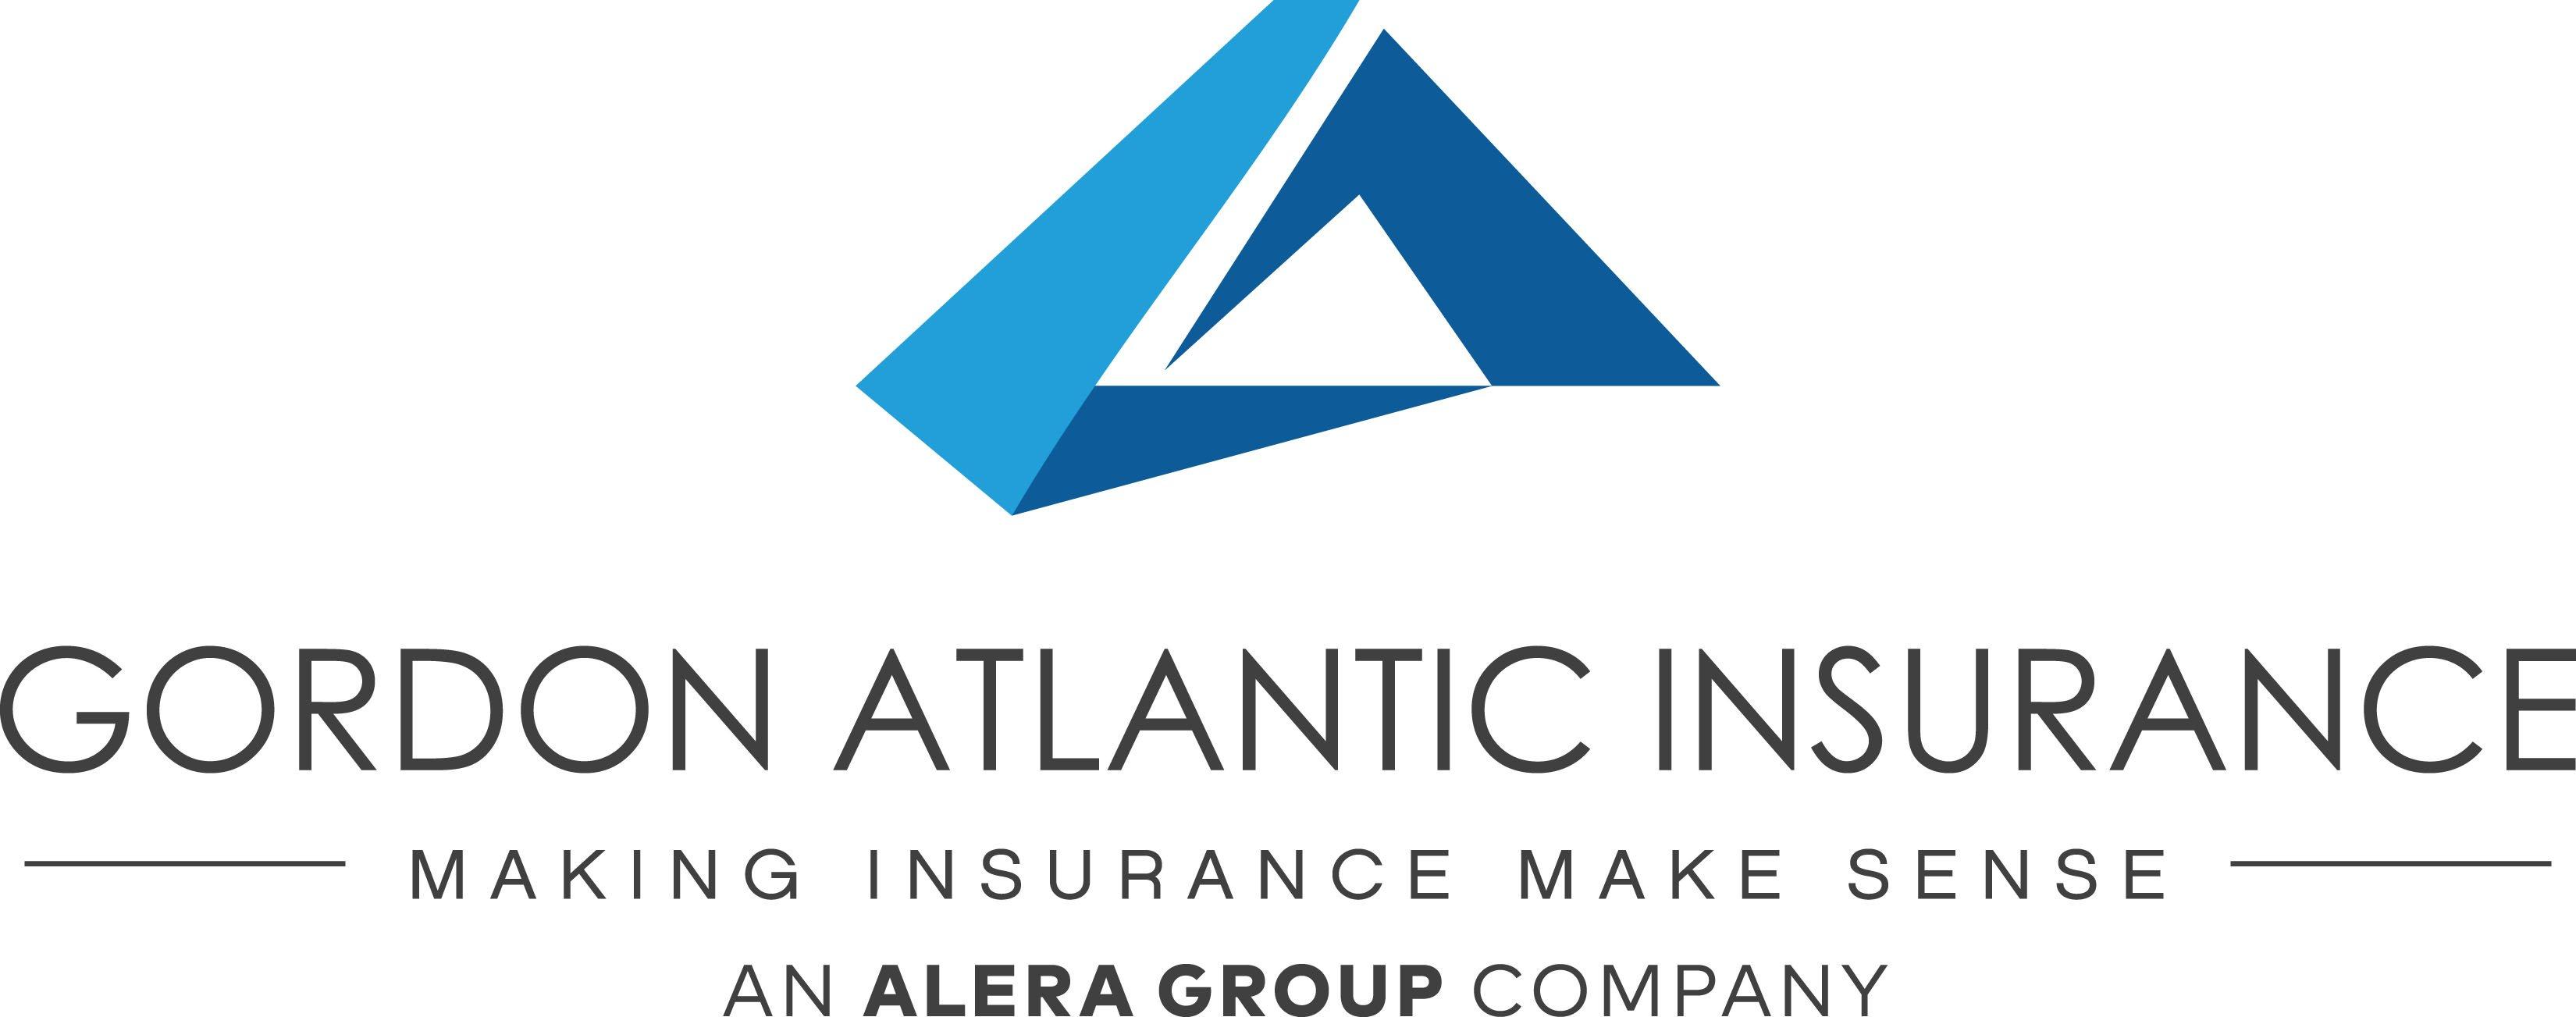 GordonAtlanticInsurance_FullColor